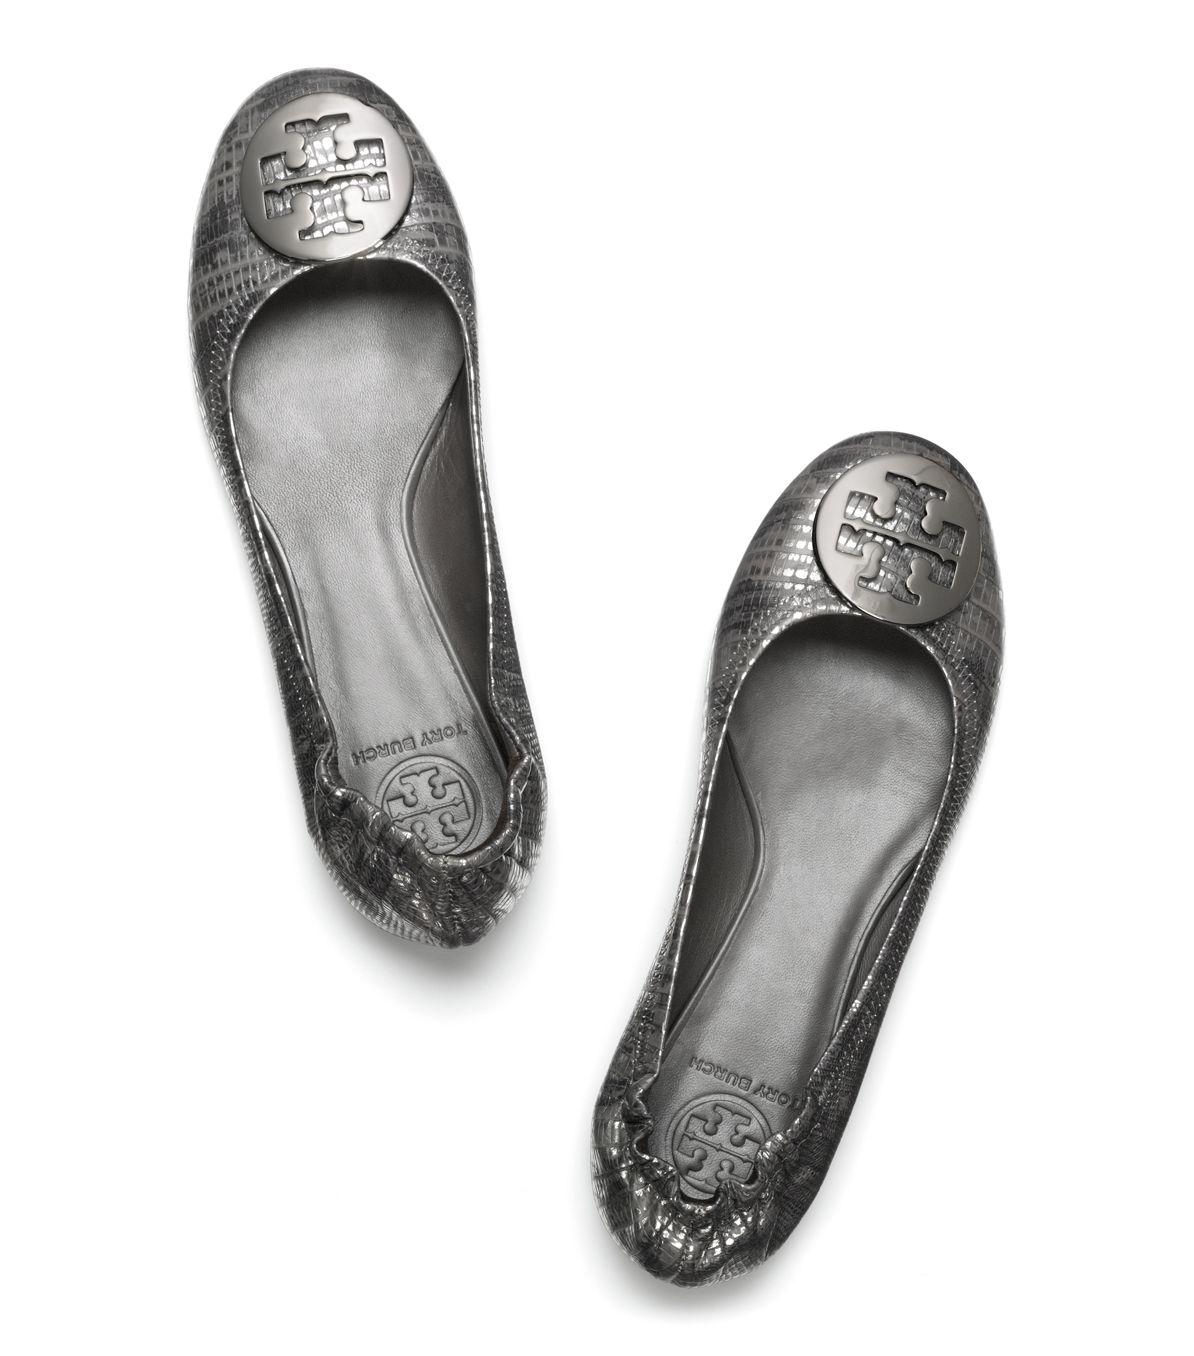 2235cc4e857 Lyst - Tory Burch Lizard Printed Reva Ballet Flat in Gray